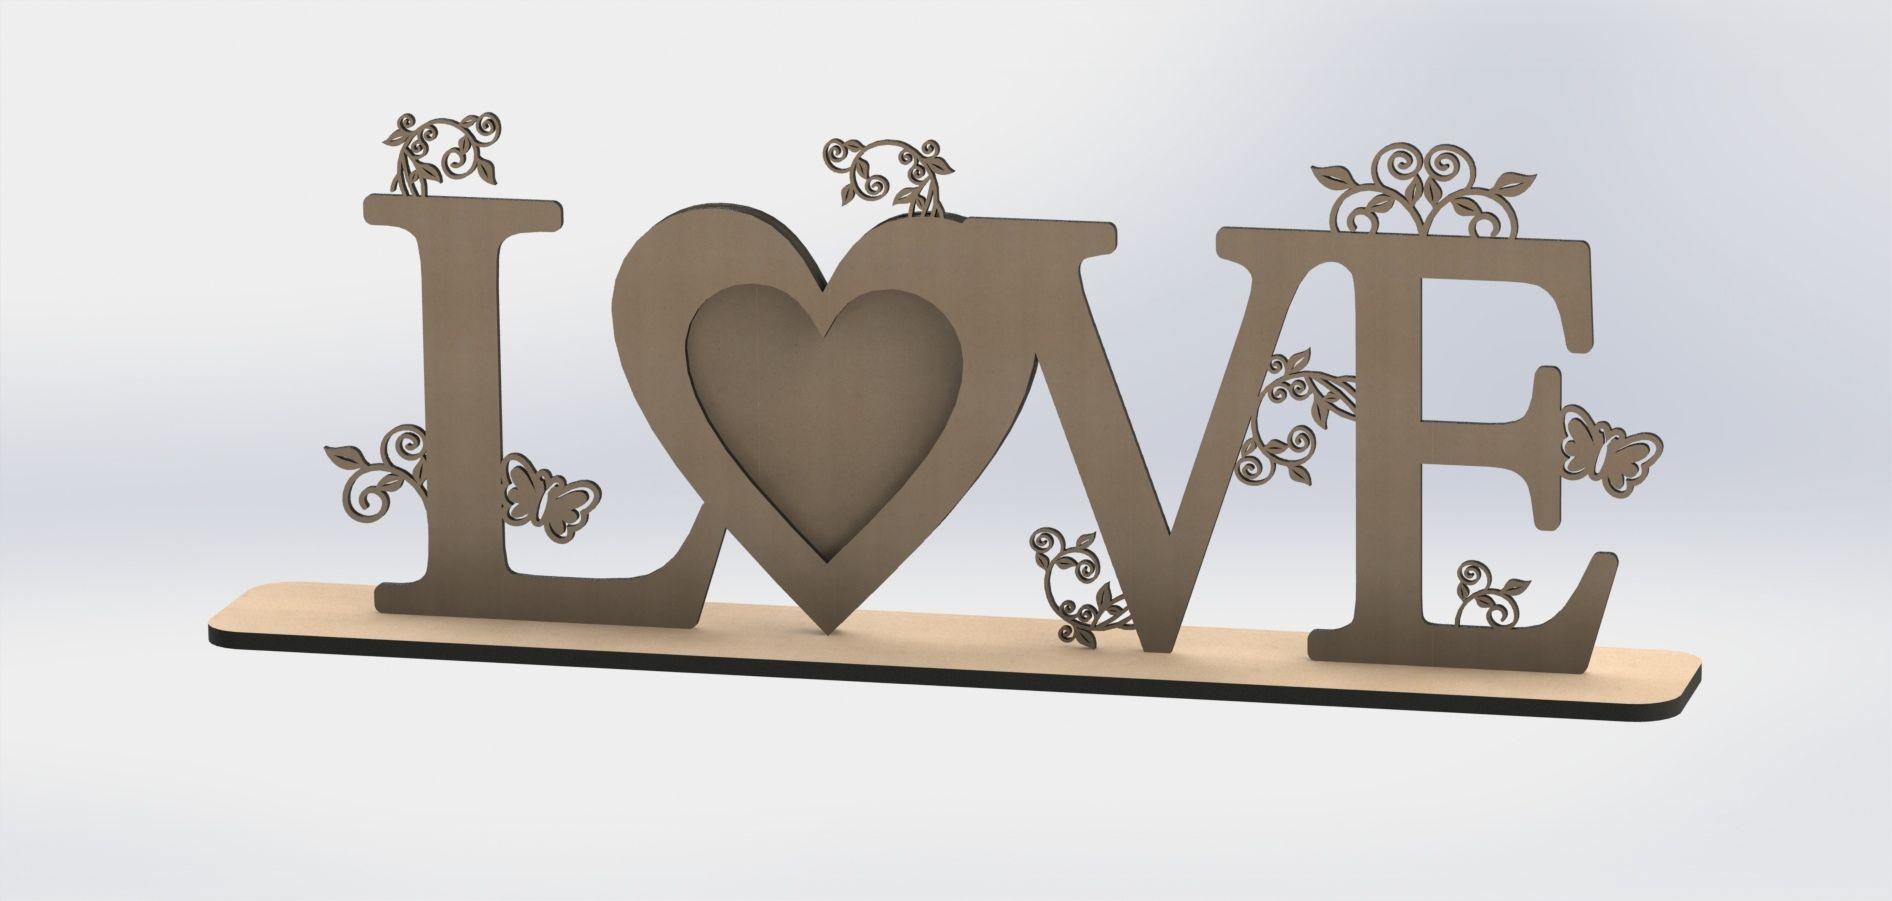 Love Heart Laser Cut DXF File Free Download | Laser cut | Laser